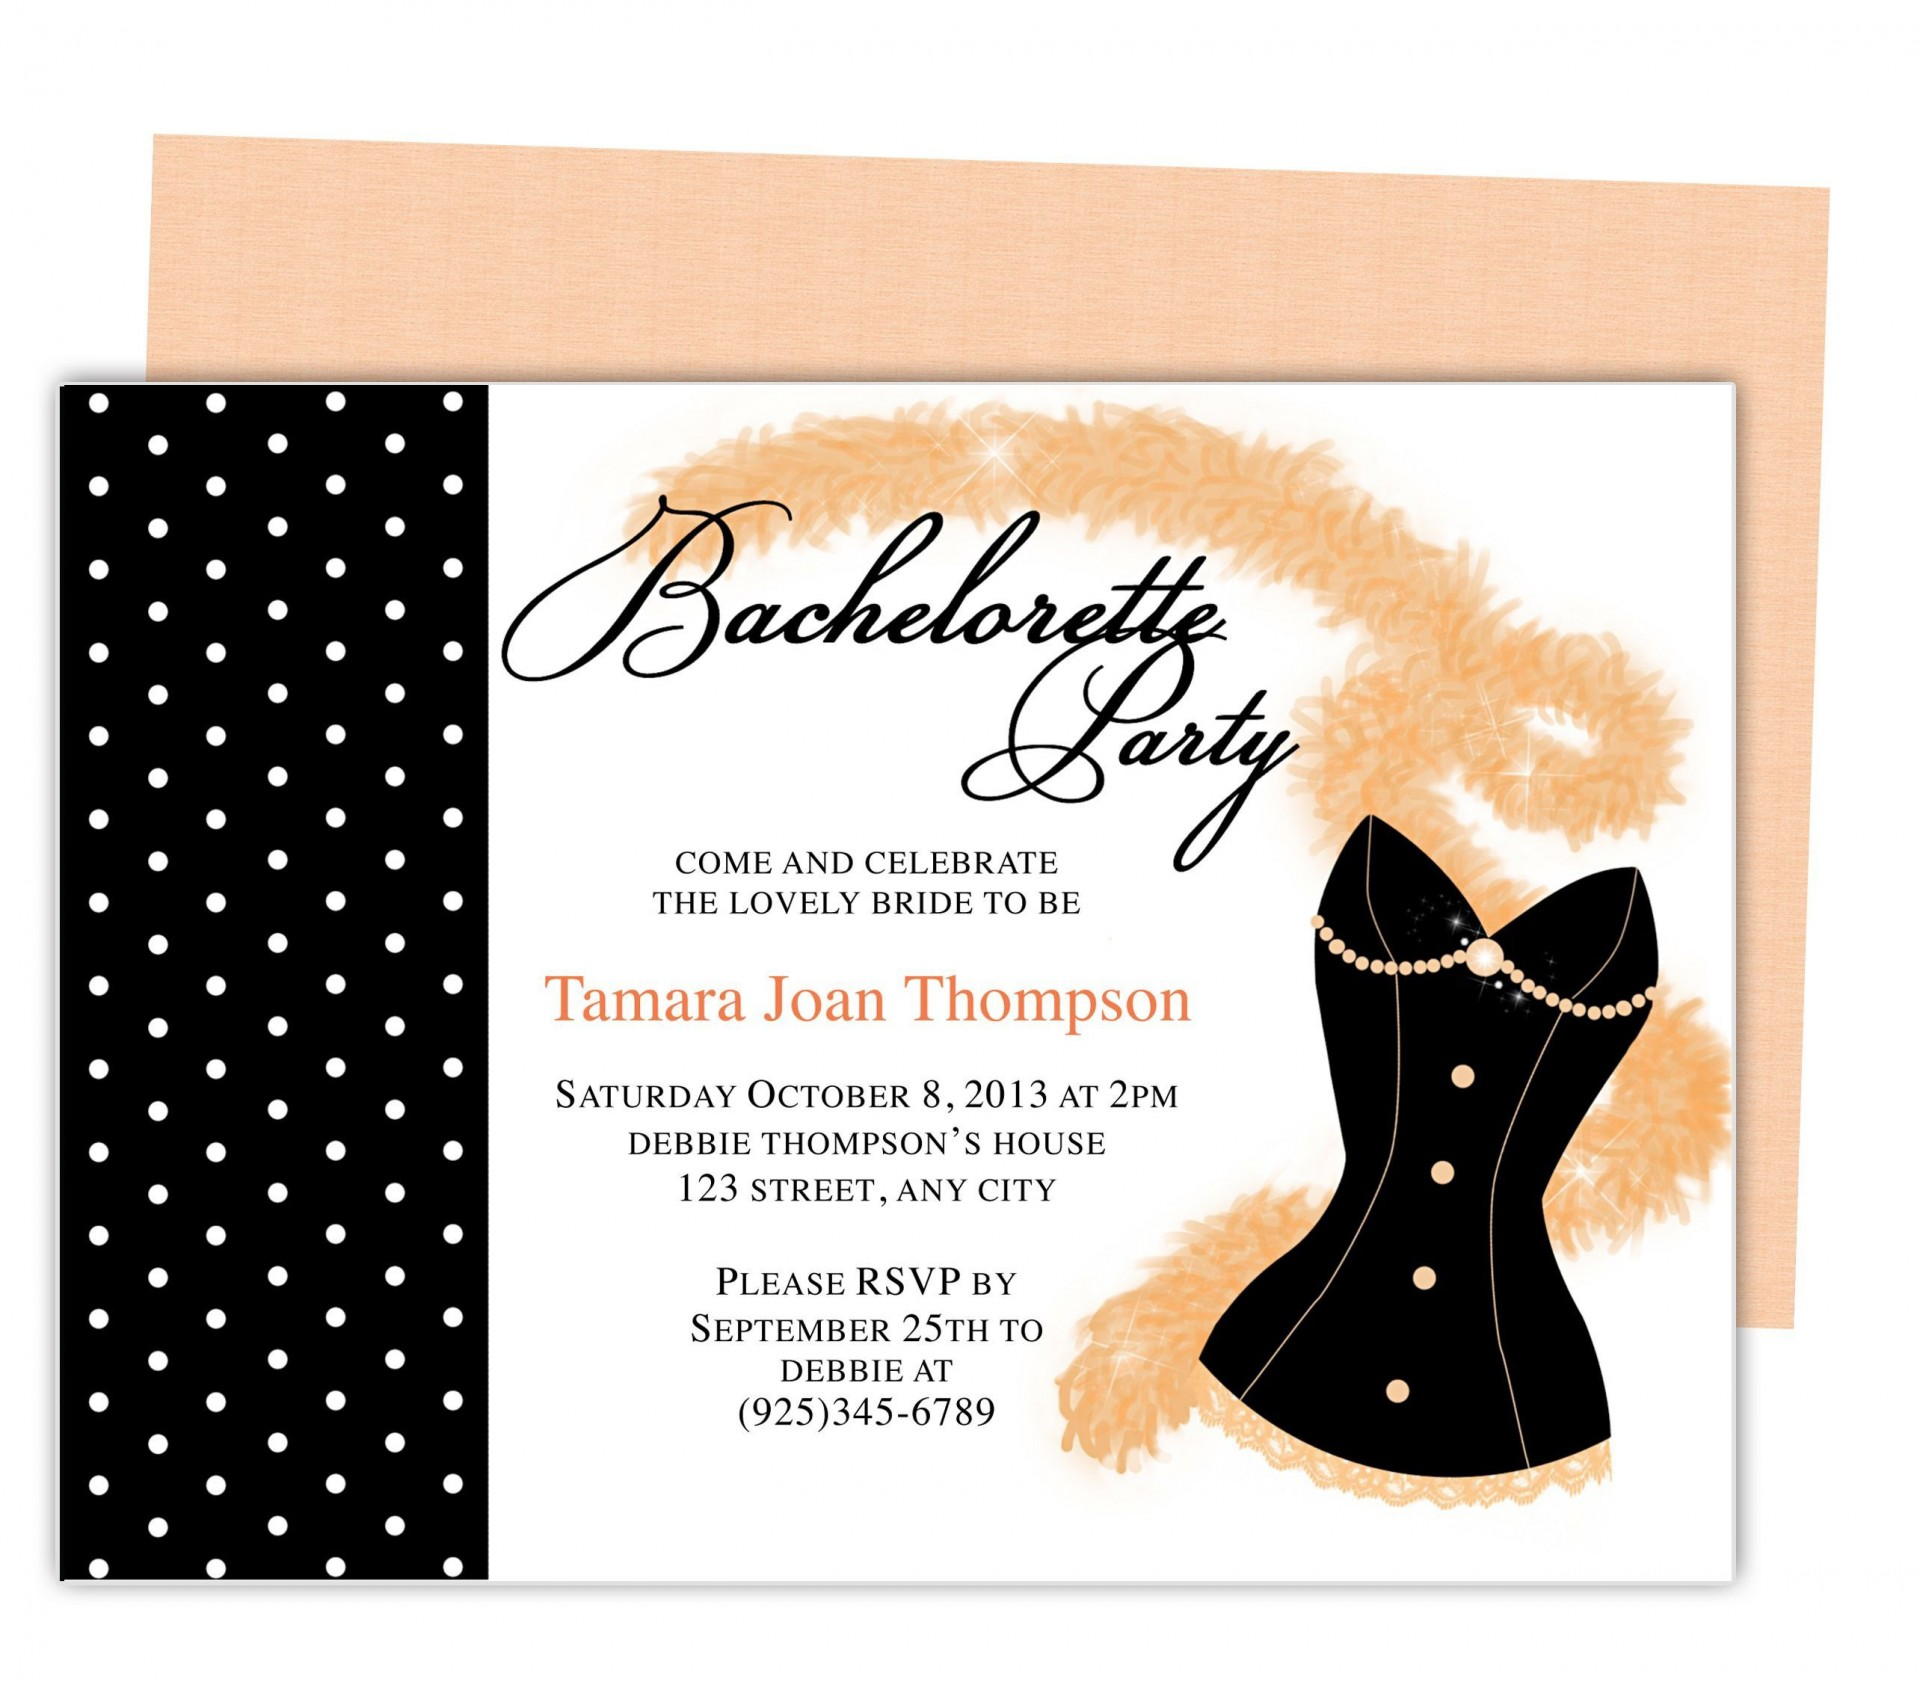 007 Stupendou Bachelorette Party Invitation Template Word Free Photo 1920